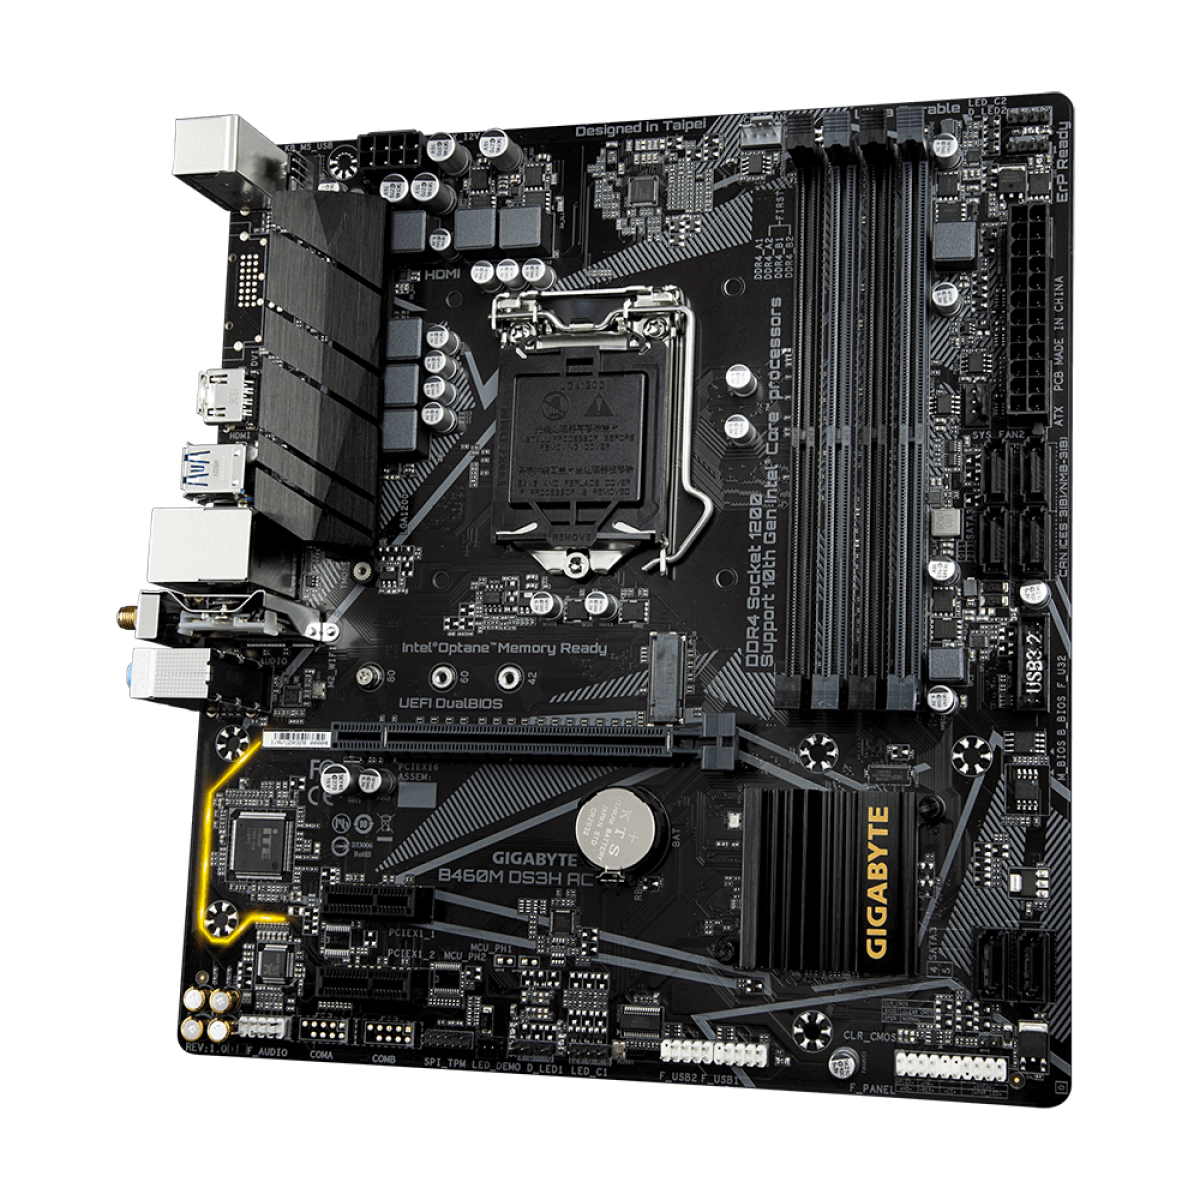 Placa Mãe Gigabyte B460M DS3H AC, Chipset B460, Intel LGA 1200 , Wi-Fi, mATX, DDR4, 9MB46M3HA-00-11